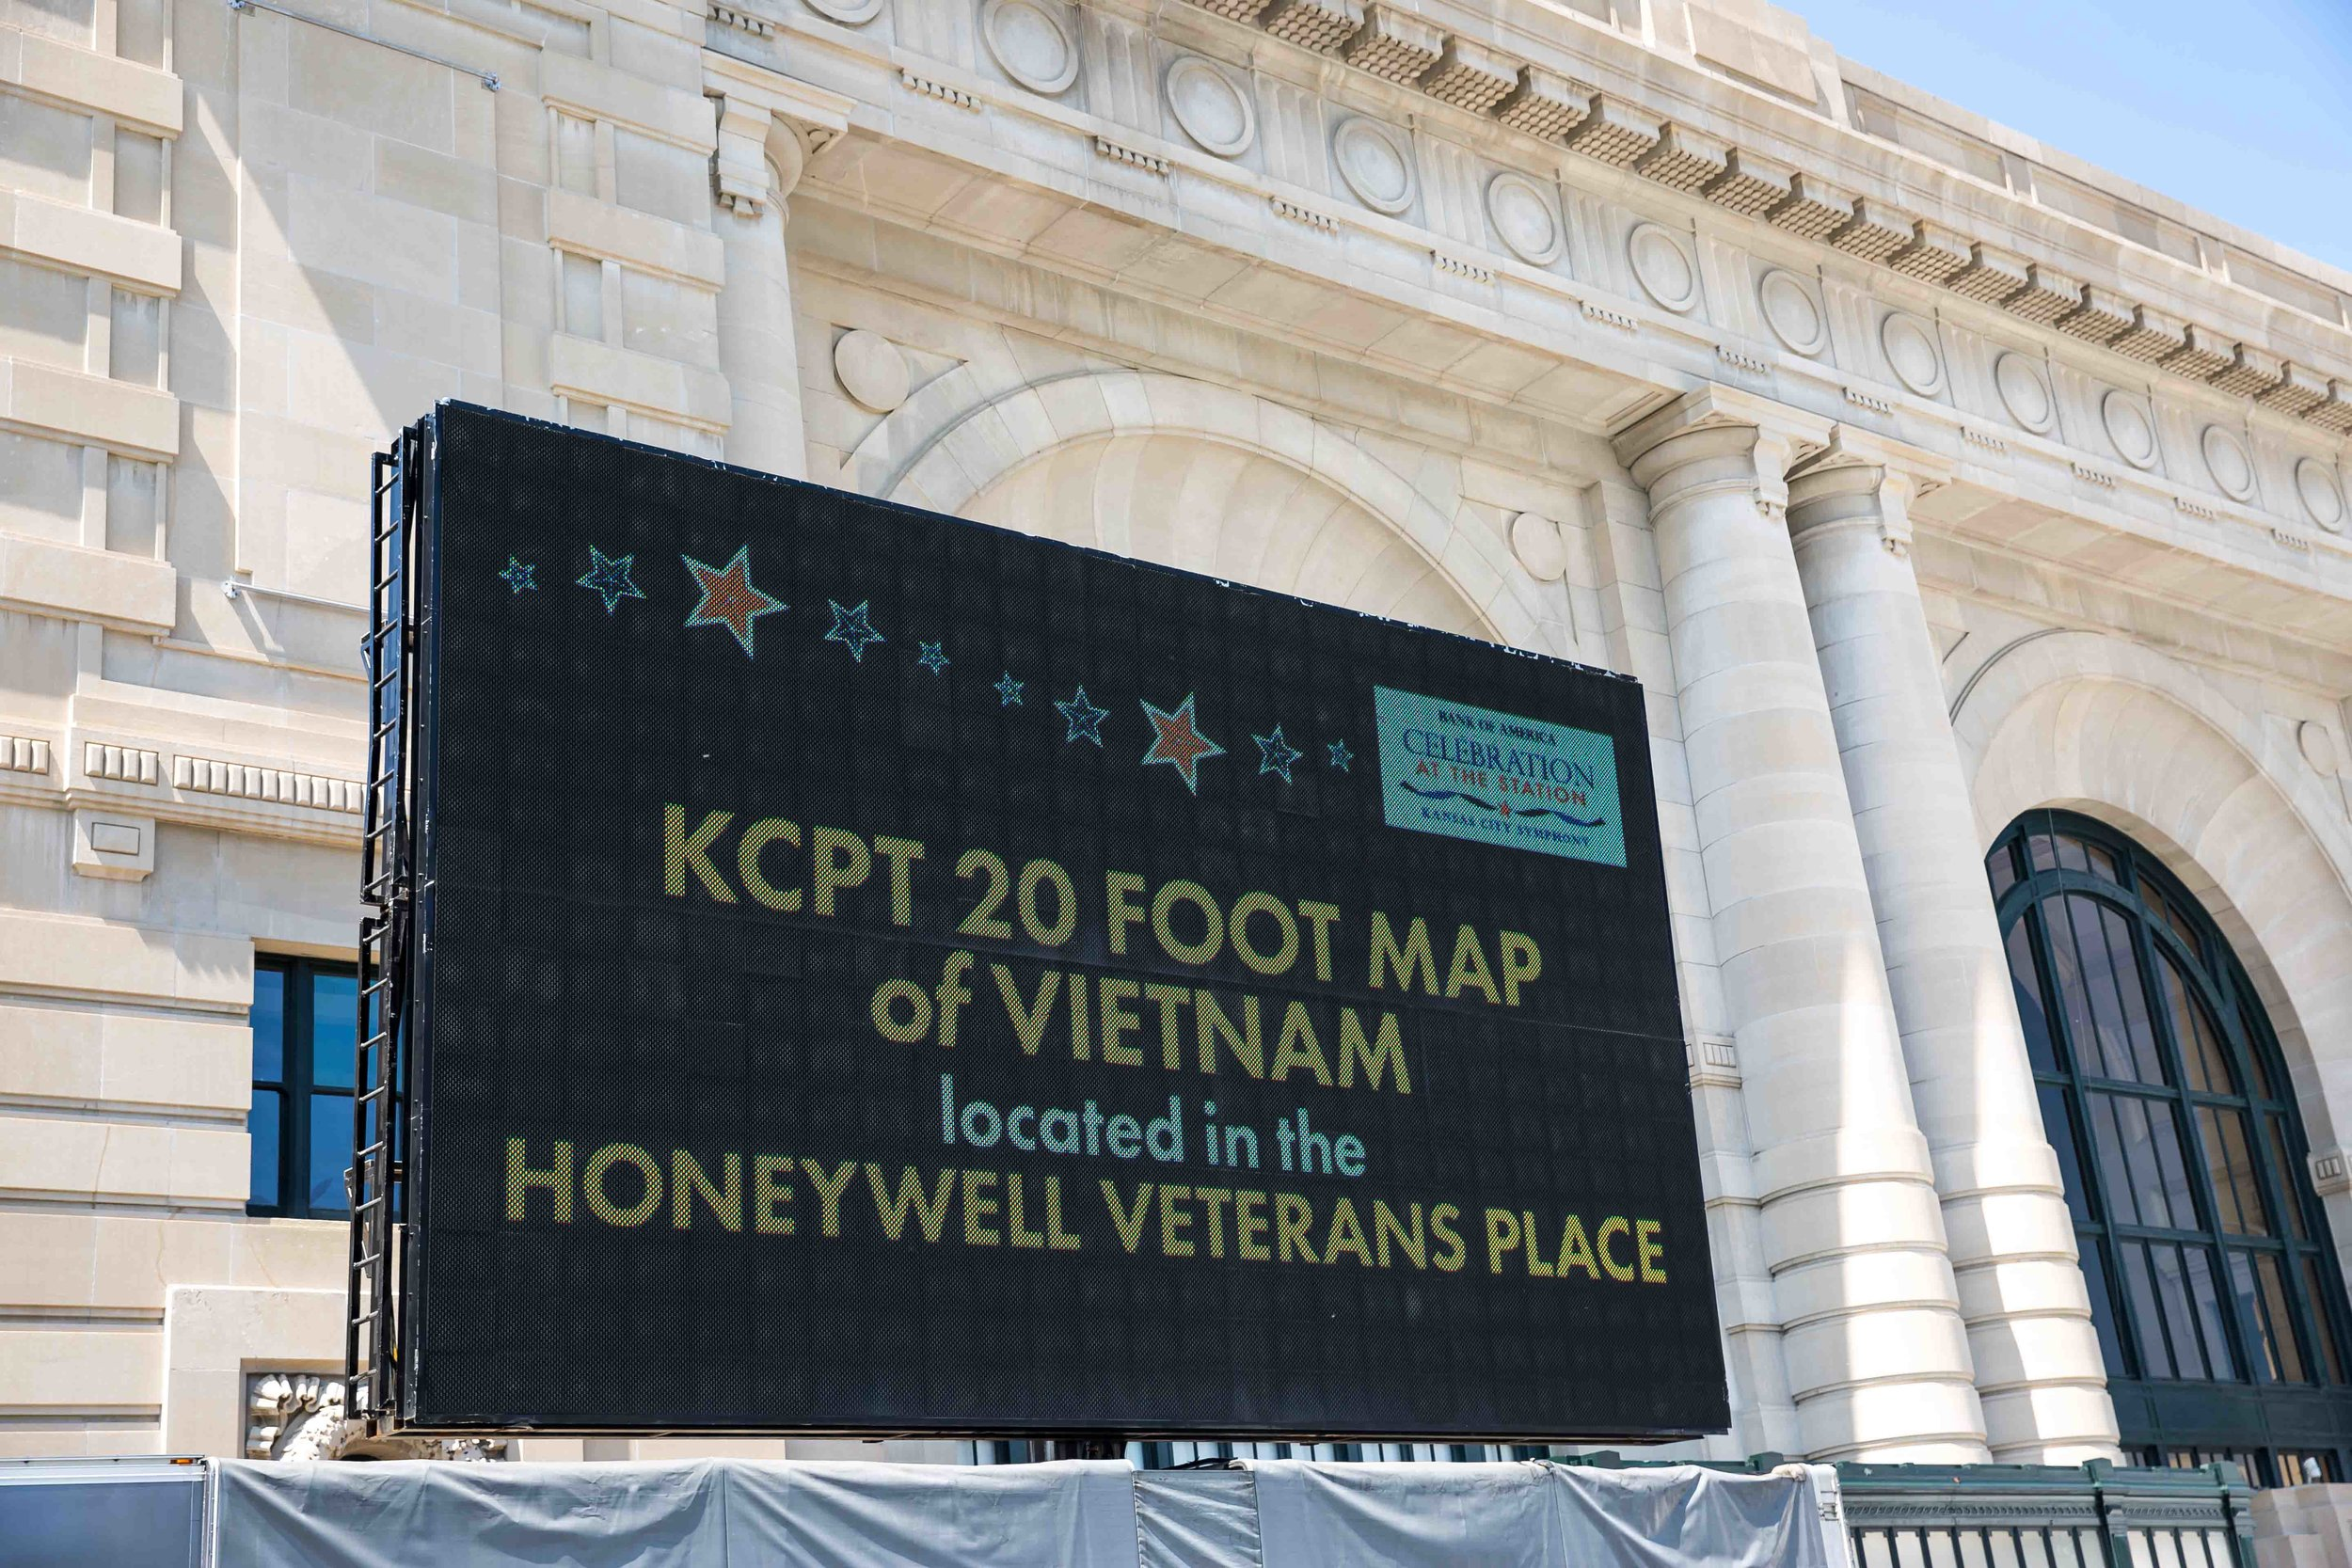 IMG_9434 Honeywell Veterans Place.jpg